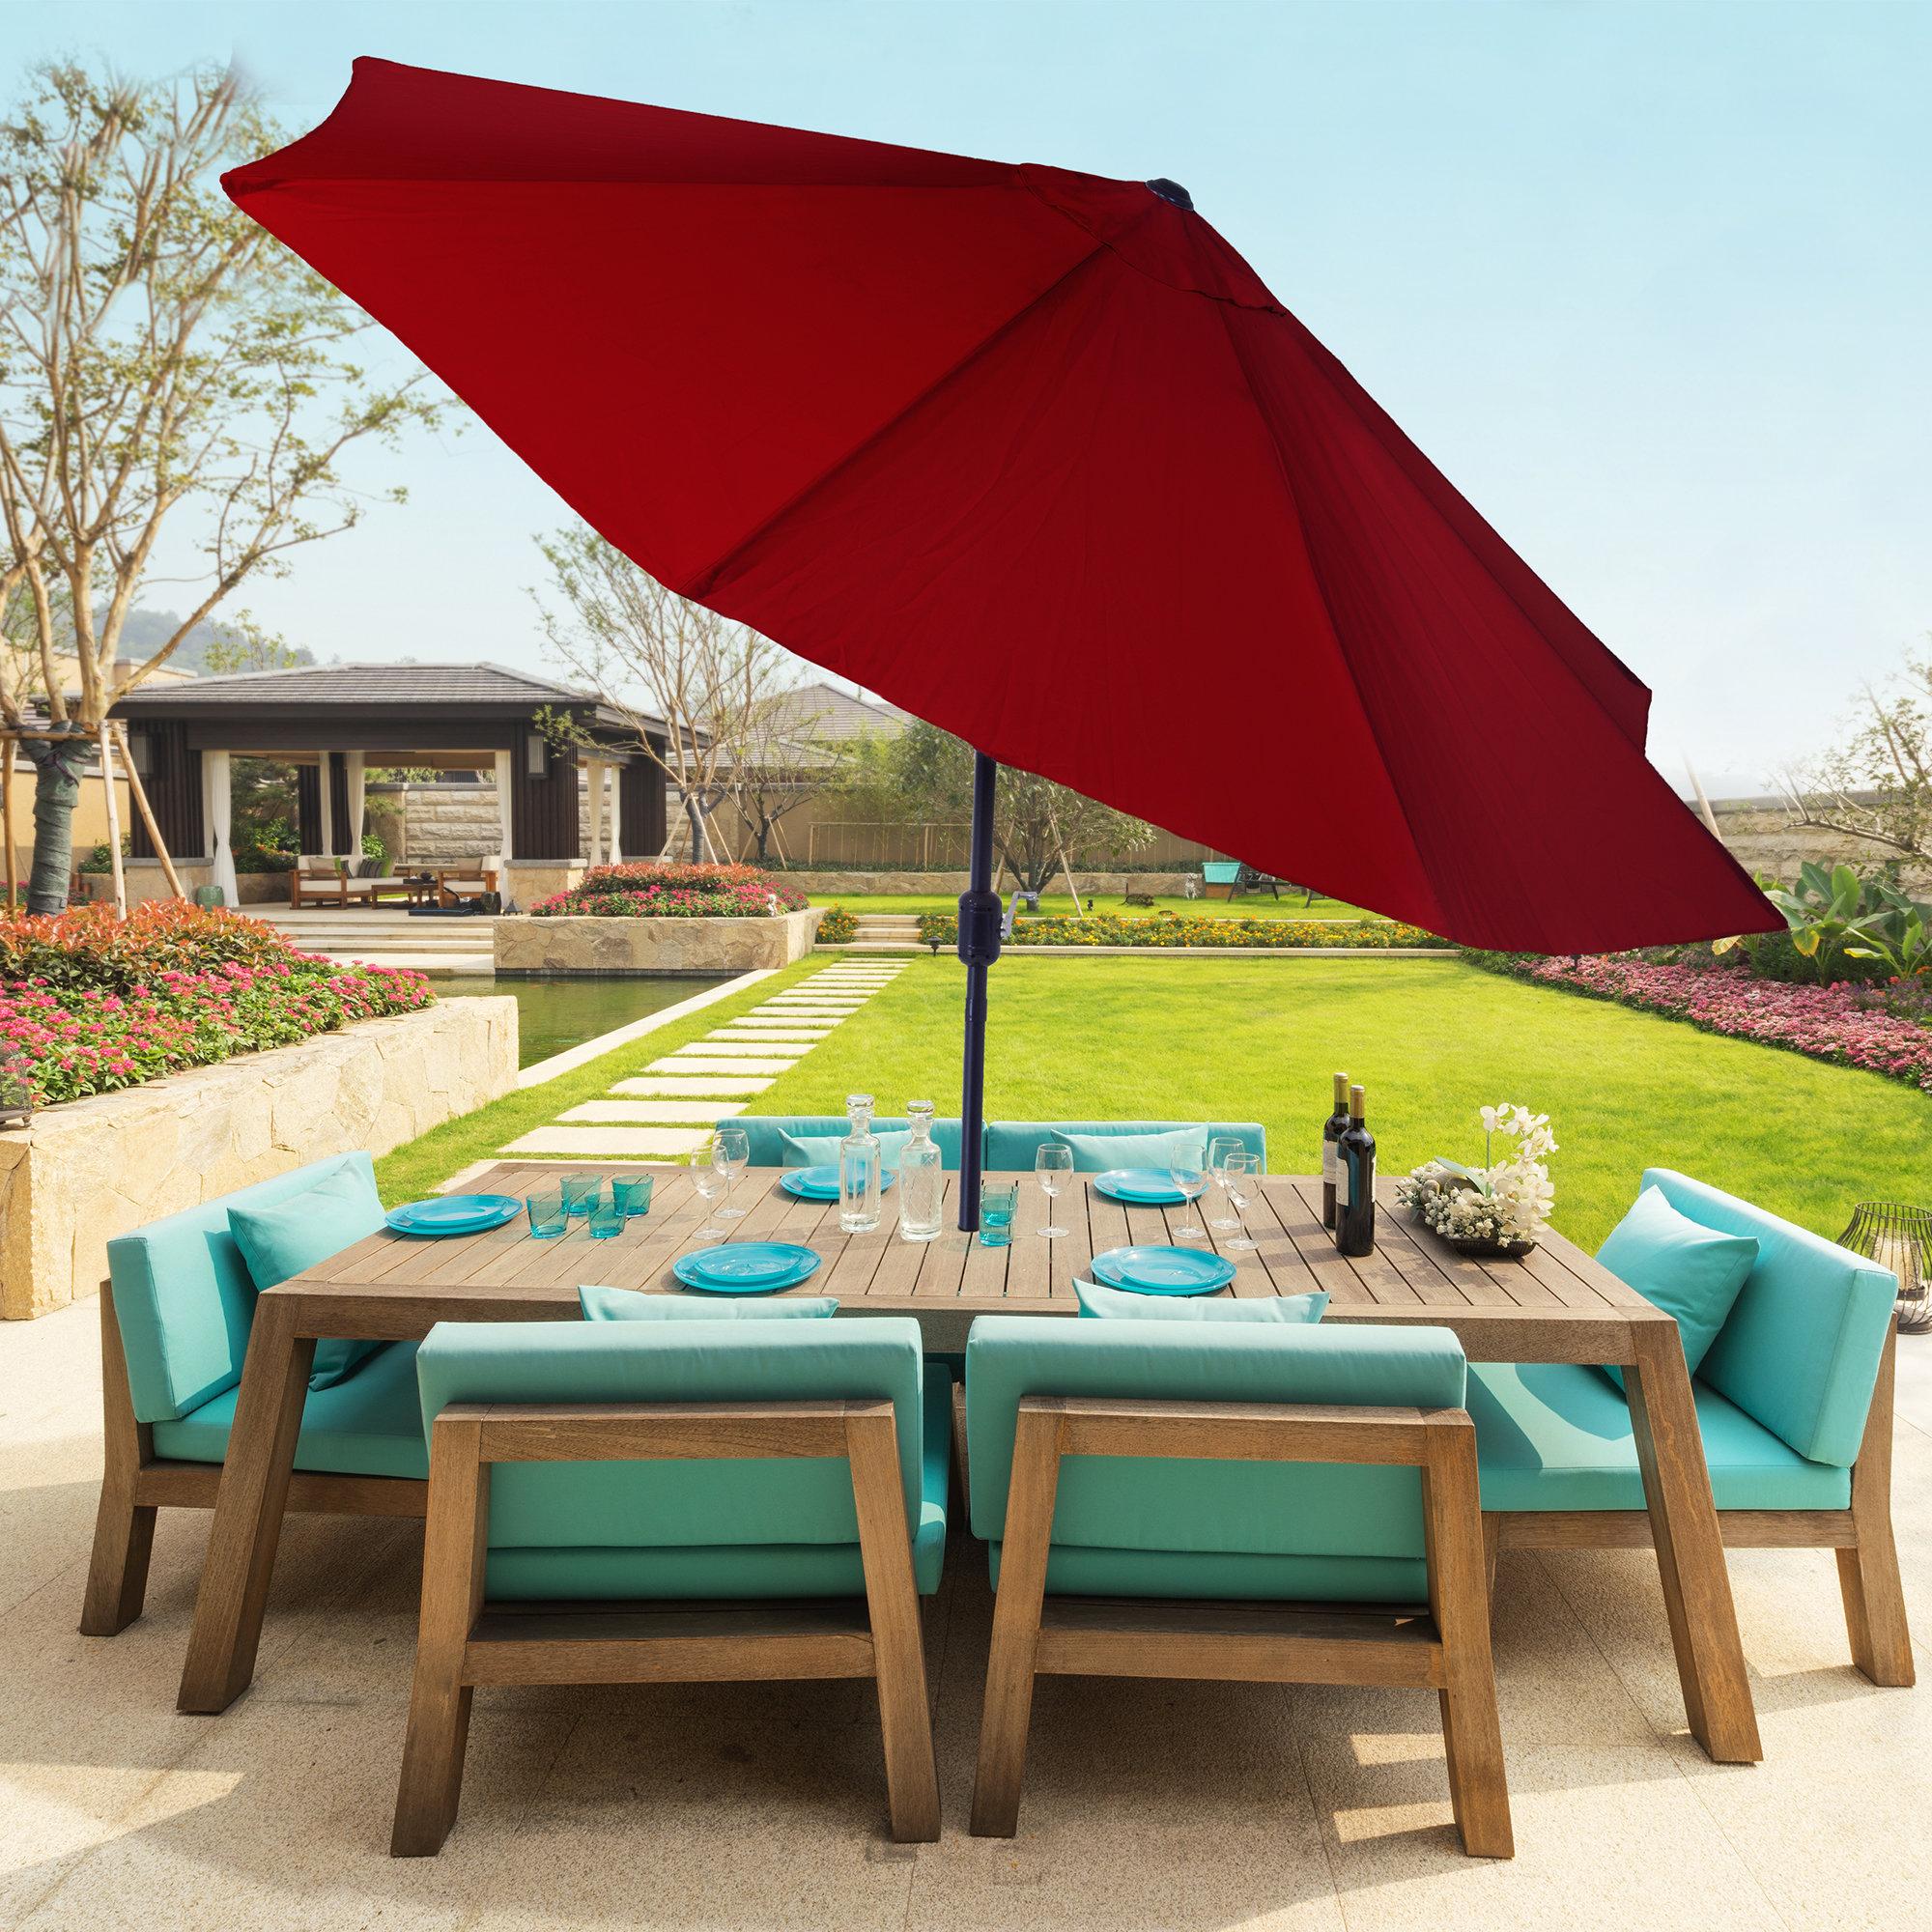 2020 Mullaney Beachcrest Home Market Umbrellas Pertaining To Beachcrest Home Kelton 10' Market Umbrella (Gallery 19 of 20)